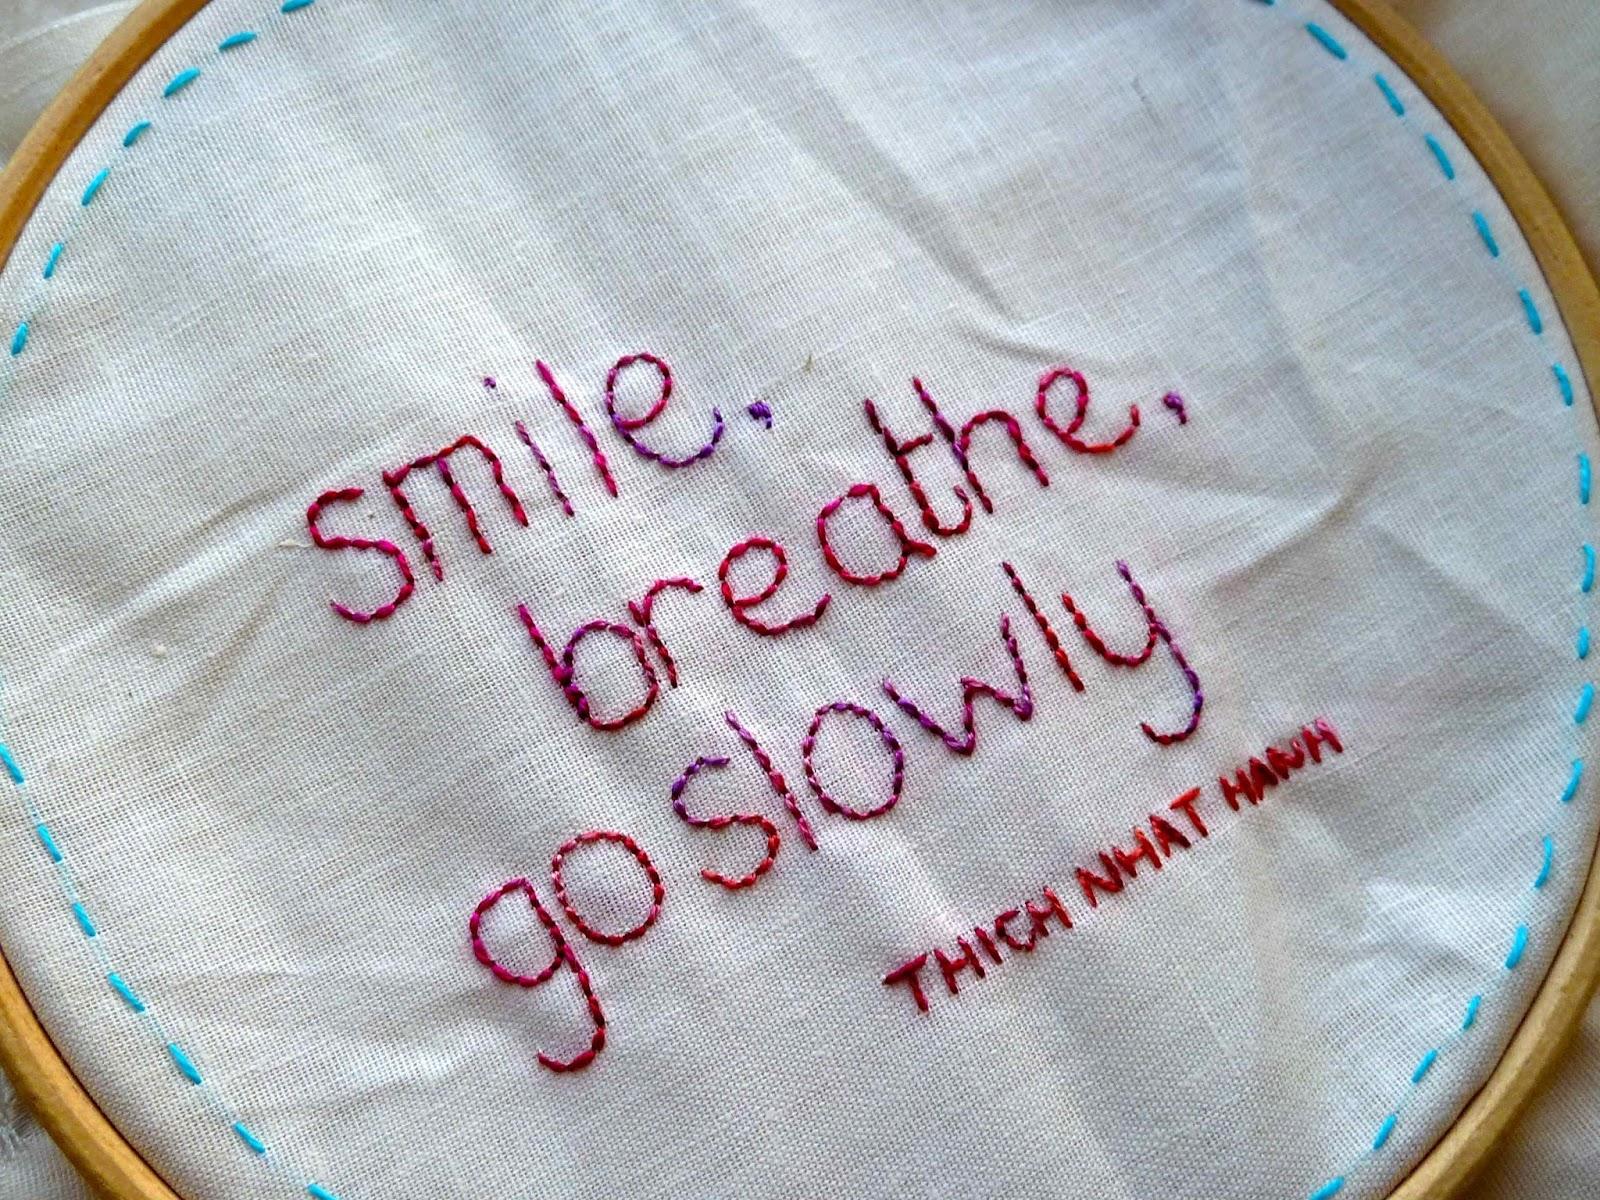 Embroidery of smile, breathe, go slowly on calico